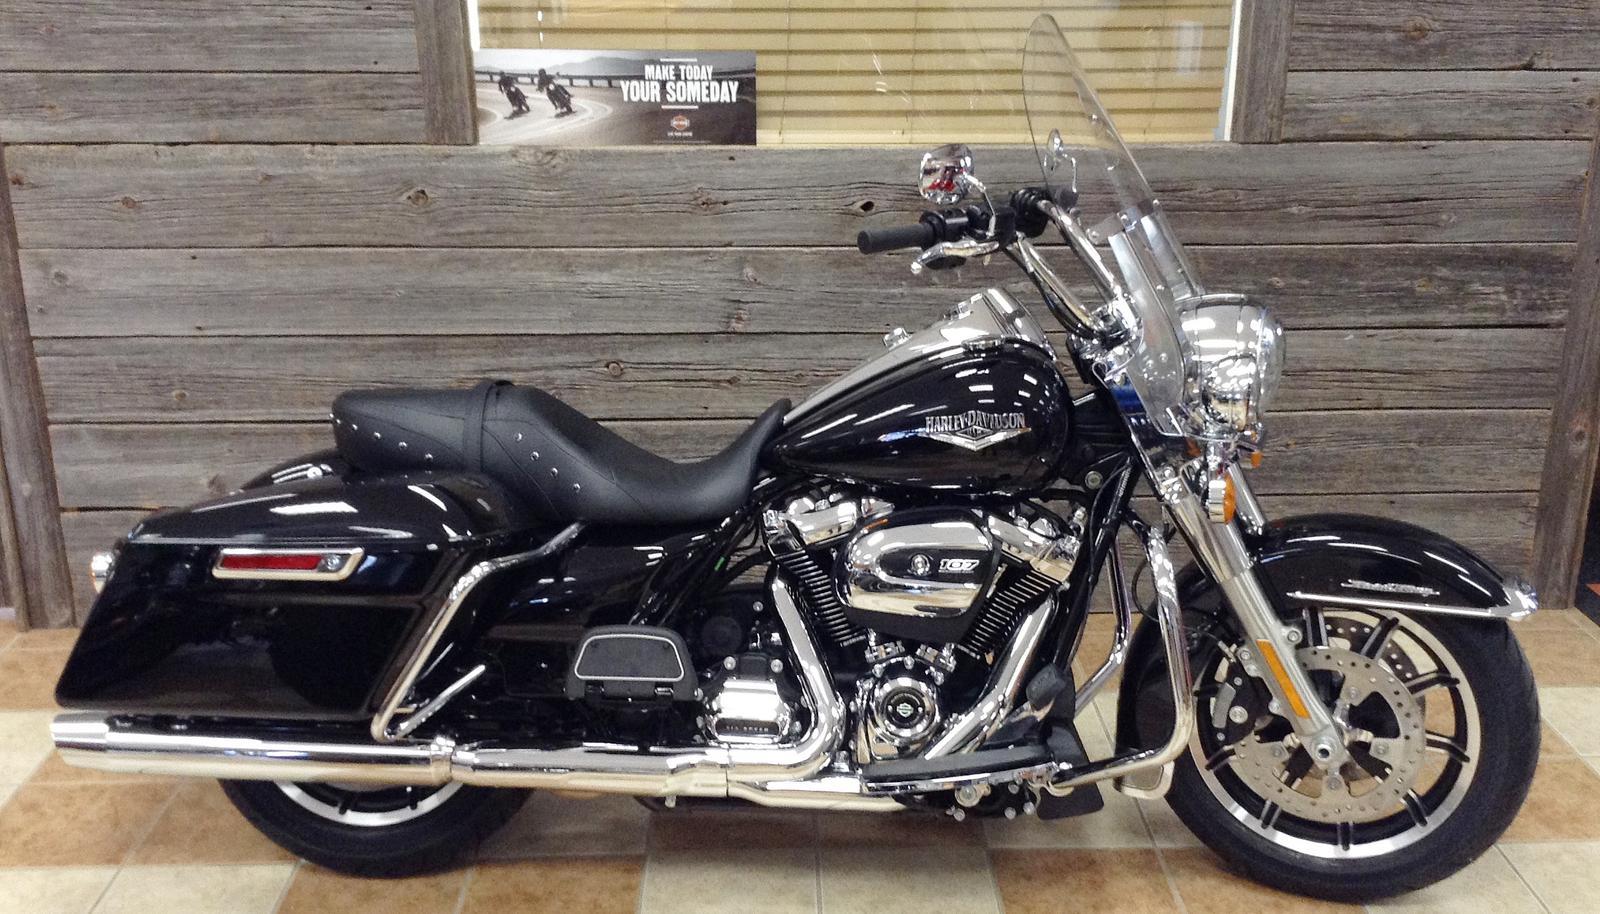 Road King For Sale >> 2019 Harley Davidson Road King For Sale In Bonduel Wi